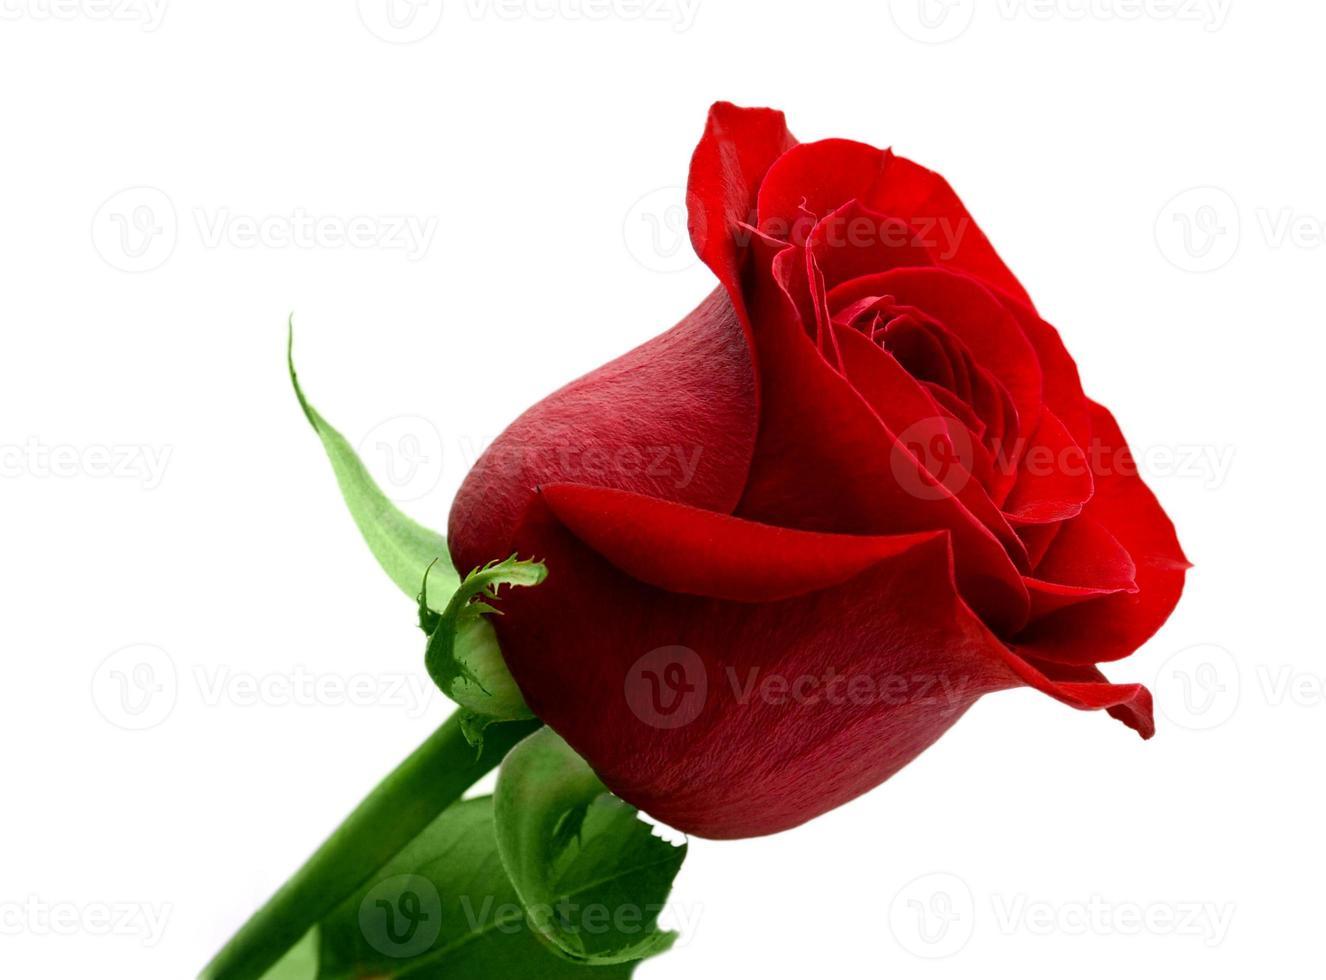 röda rosor grönt blad foto